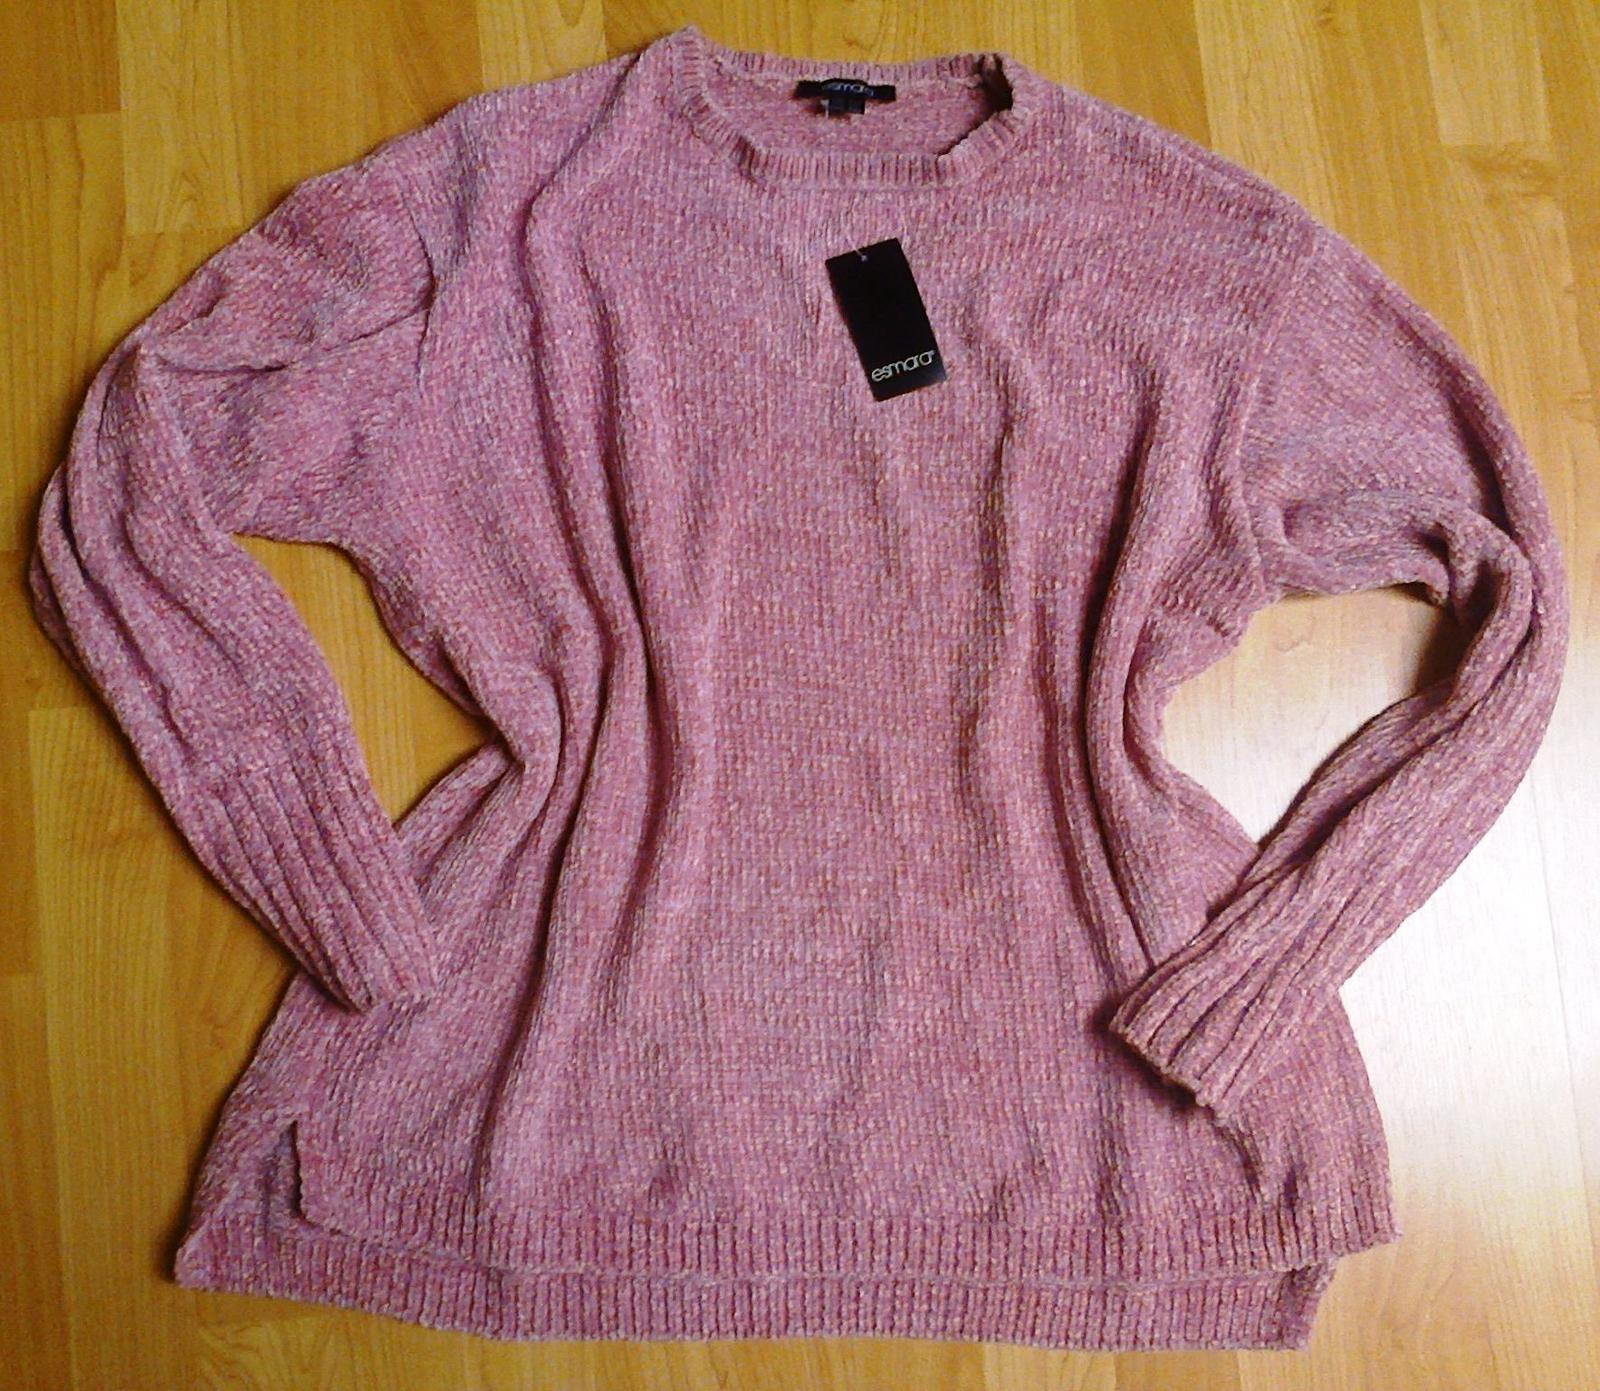 Dámský svetr - Obrázek č. 1